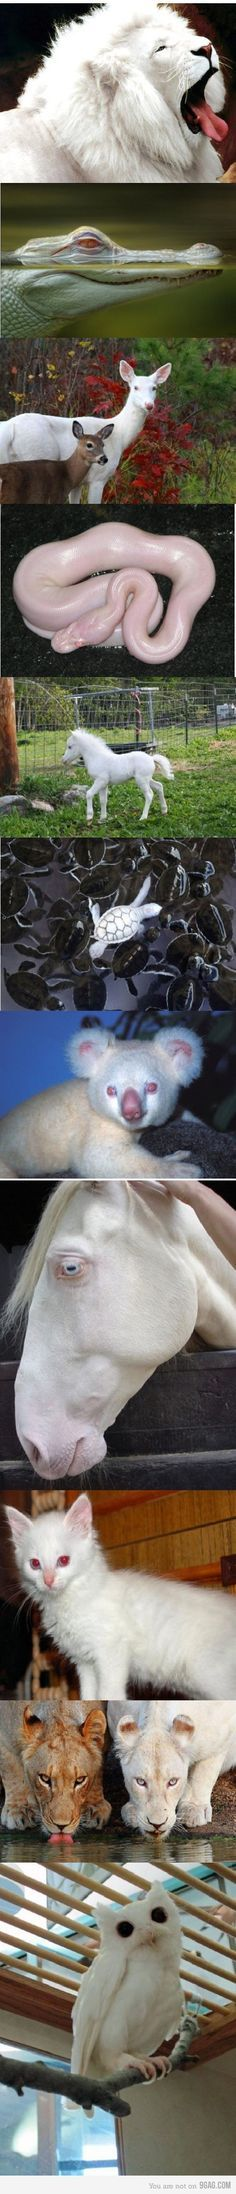 albinos!